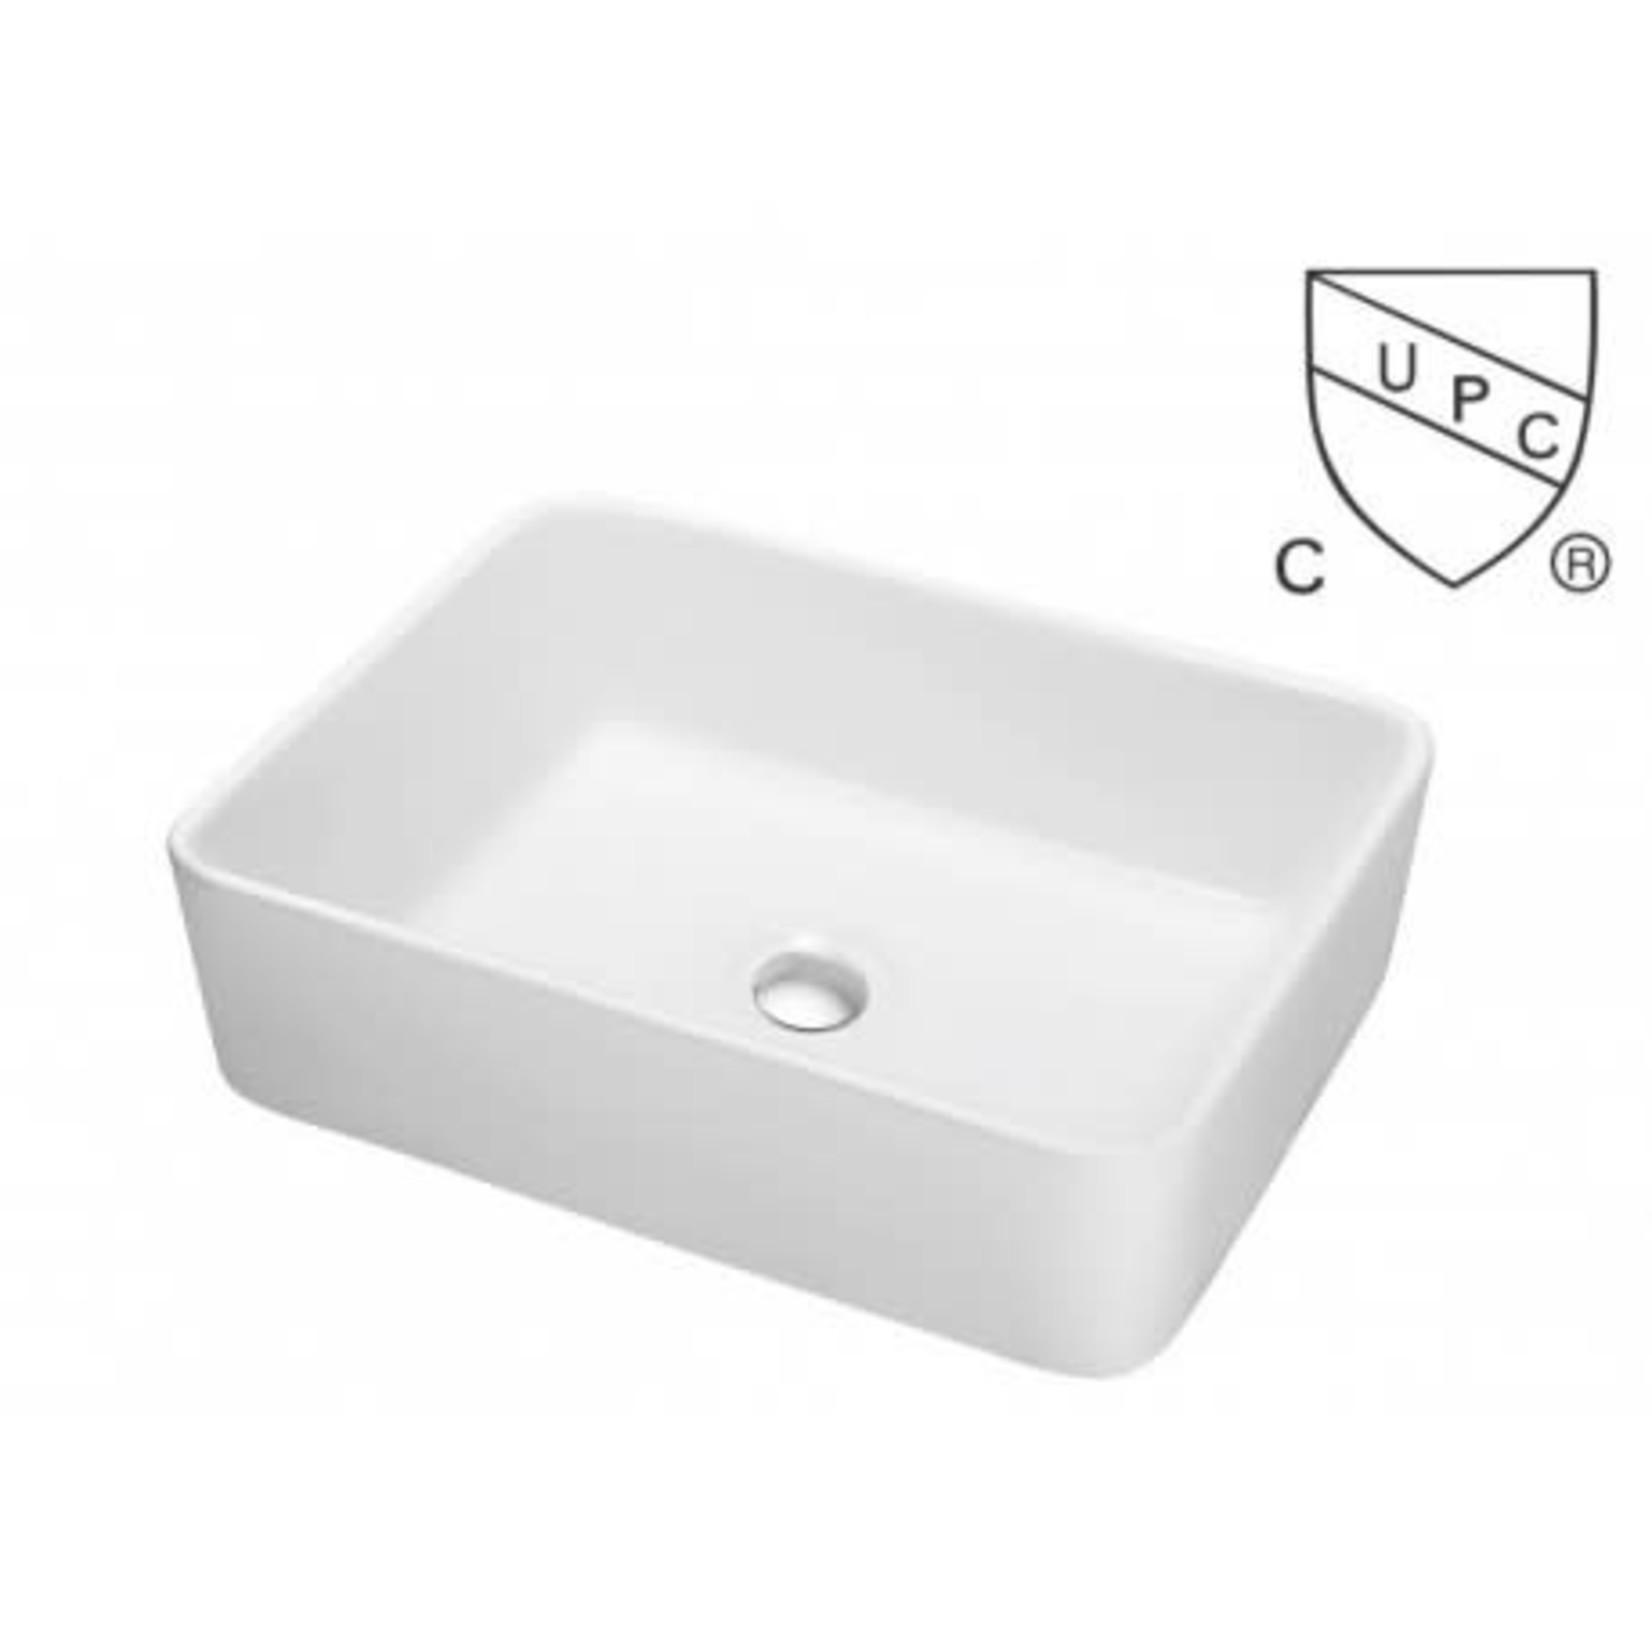 Luhö Luho Porcelain Washbasin 6009A